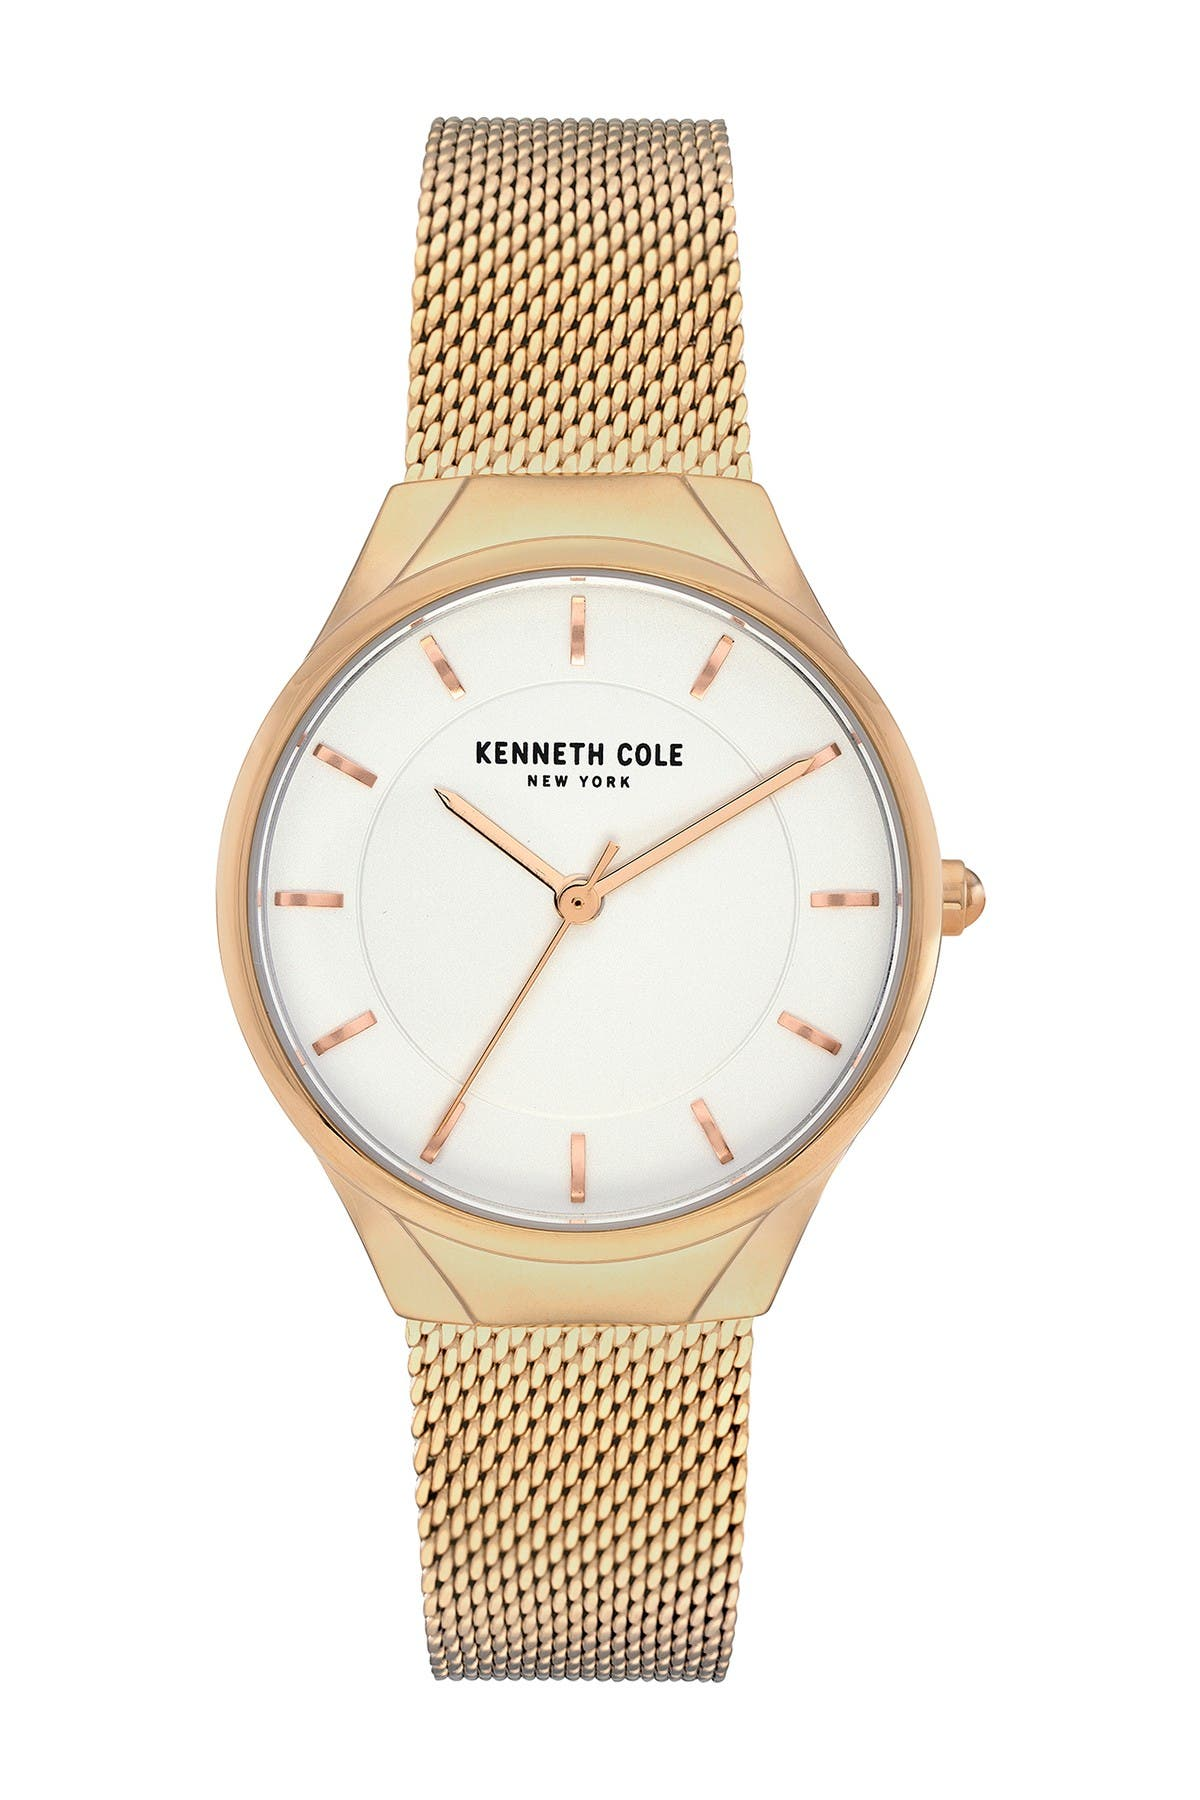 Image of Kenneth Cole New York Women's Mesh Bracelet Watch, 32mm